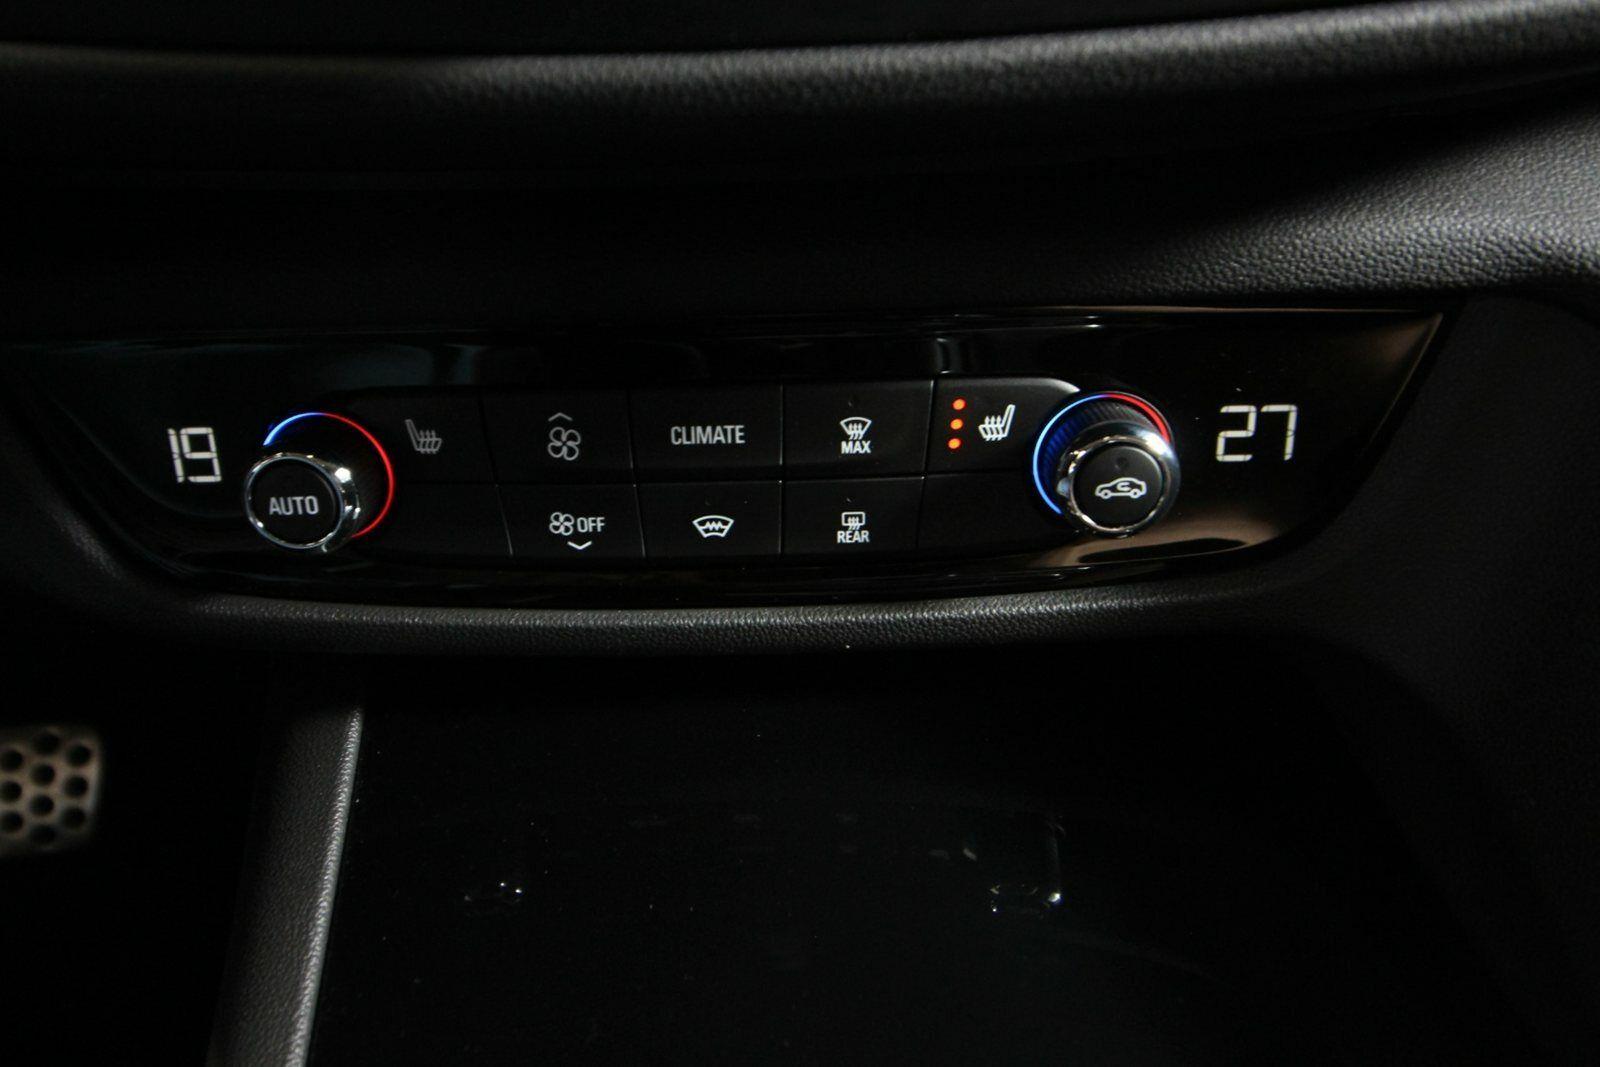 Opel Insignia CDTi 170 Dynamic GS aut.